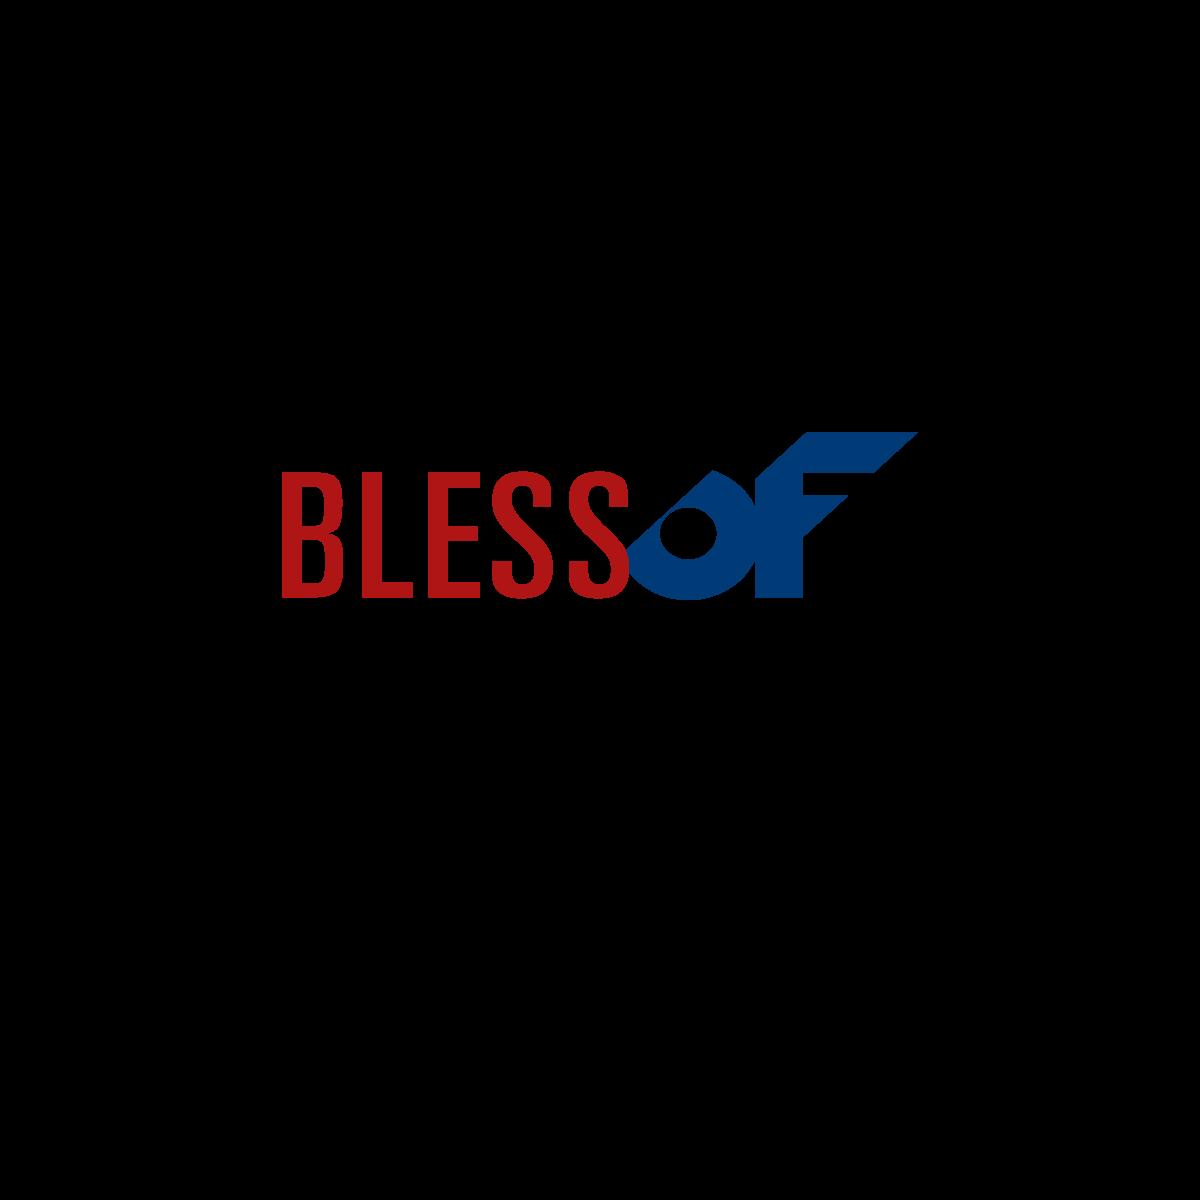 intermar-marketing-corporate-design-blessof-logo.png